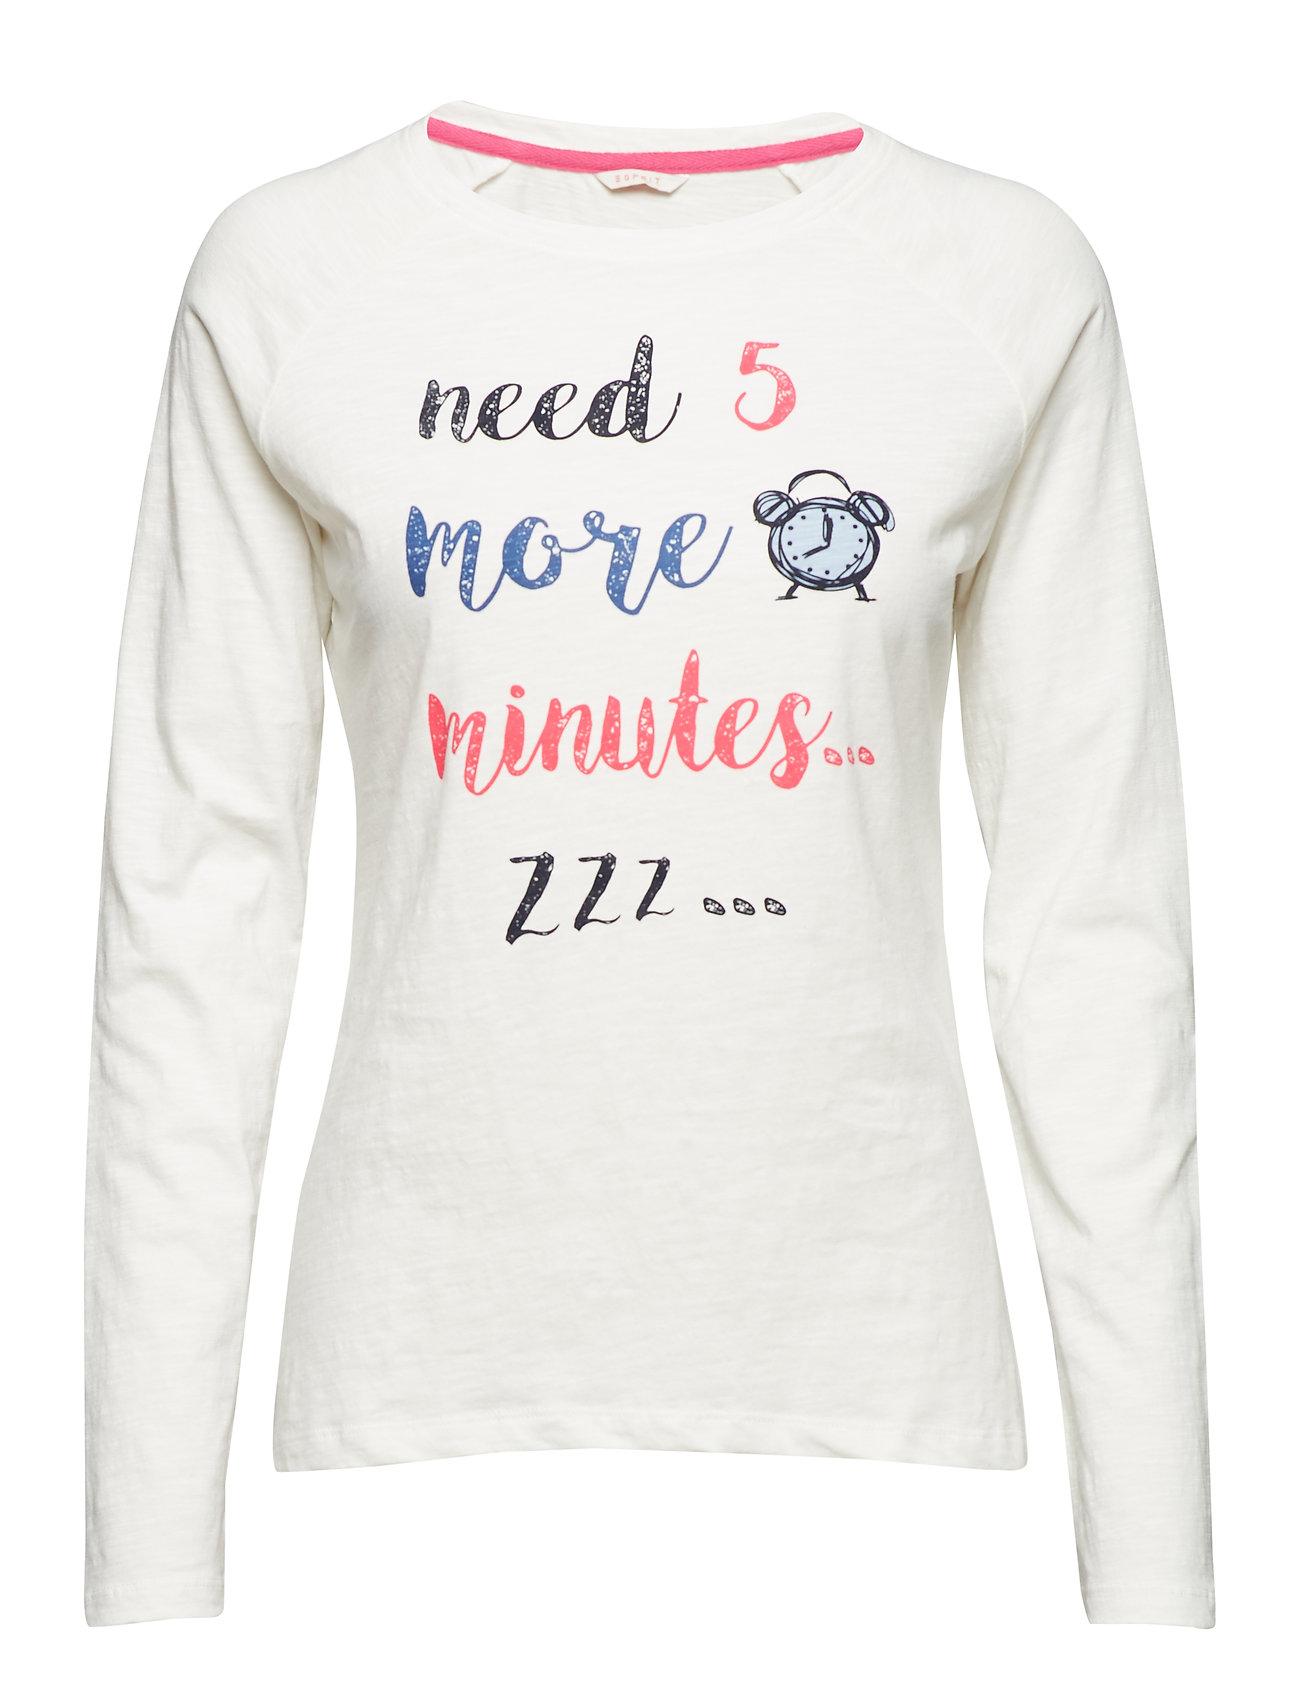 Night-t-shirts (Off White) (£19) - Esprit Bodywear Women -  ed79ab8c7